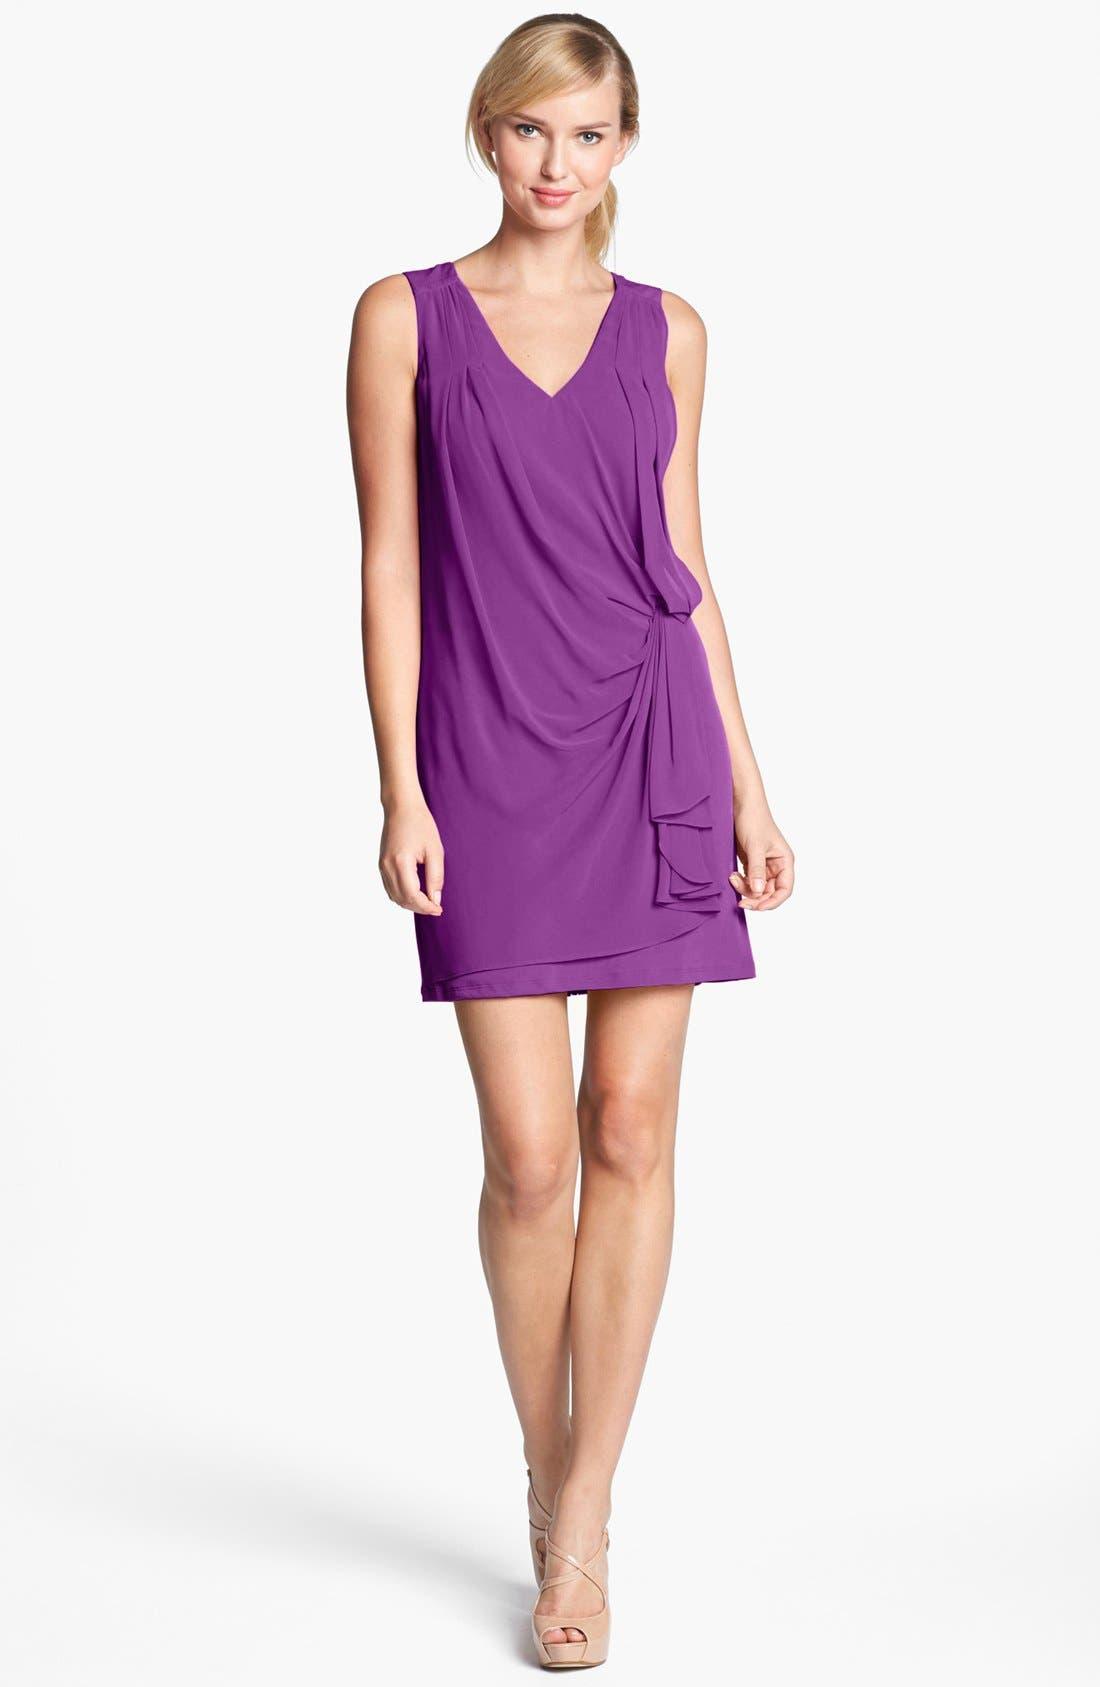 Alternate Image 1 Selected - Vince Camuto Draped Tunic Dress